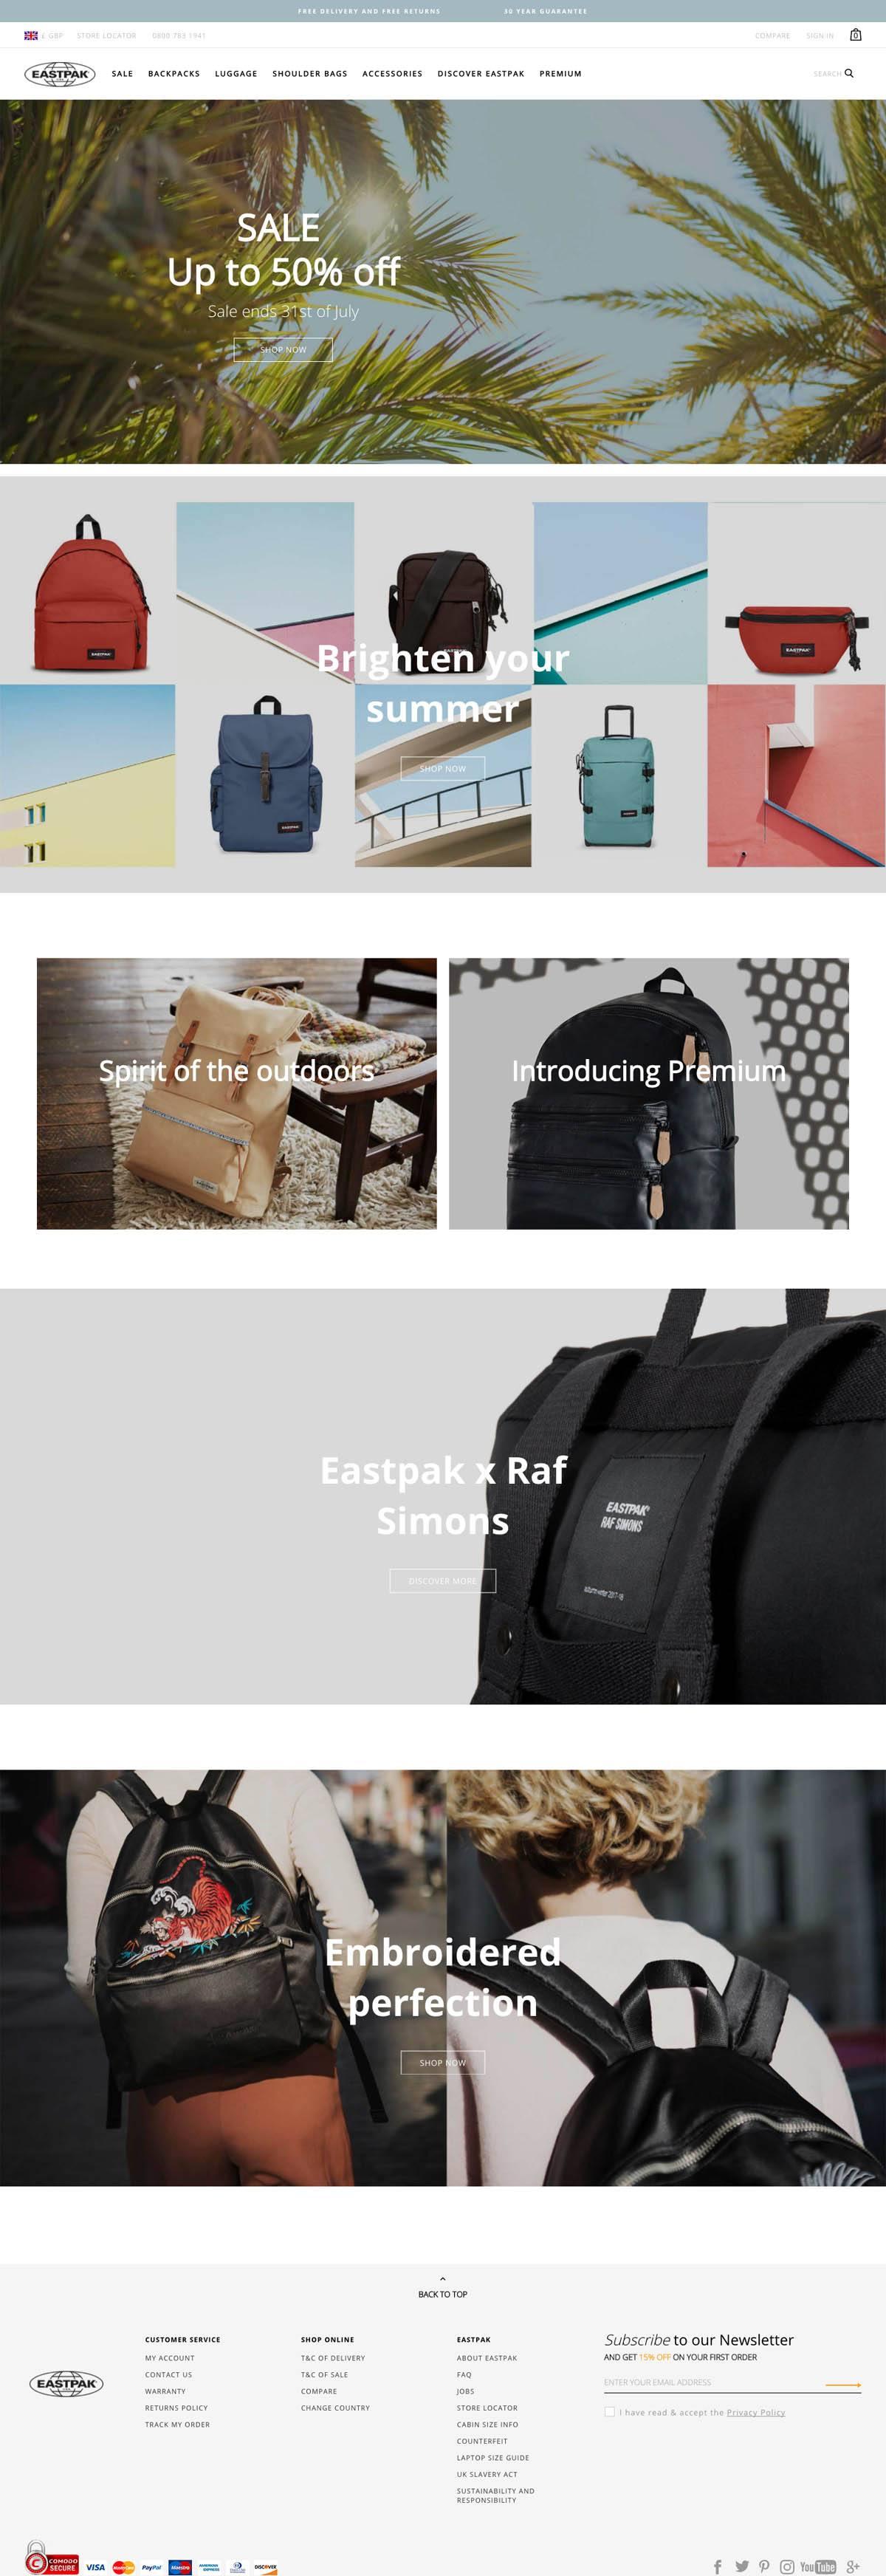 eCommerce website: Eastpak